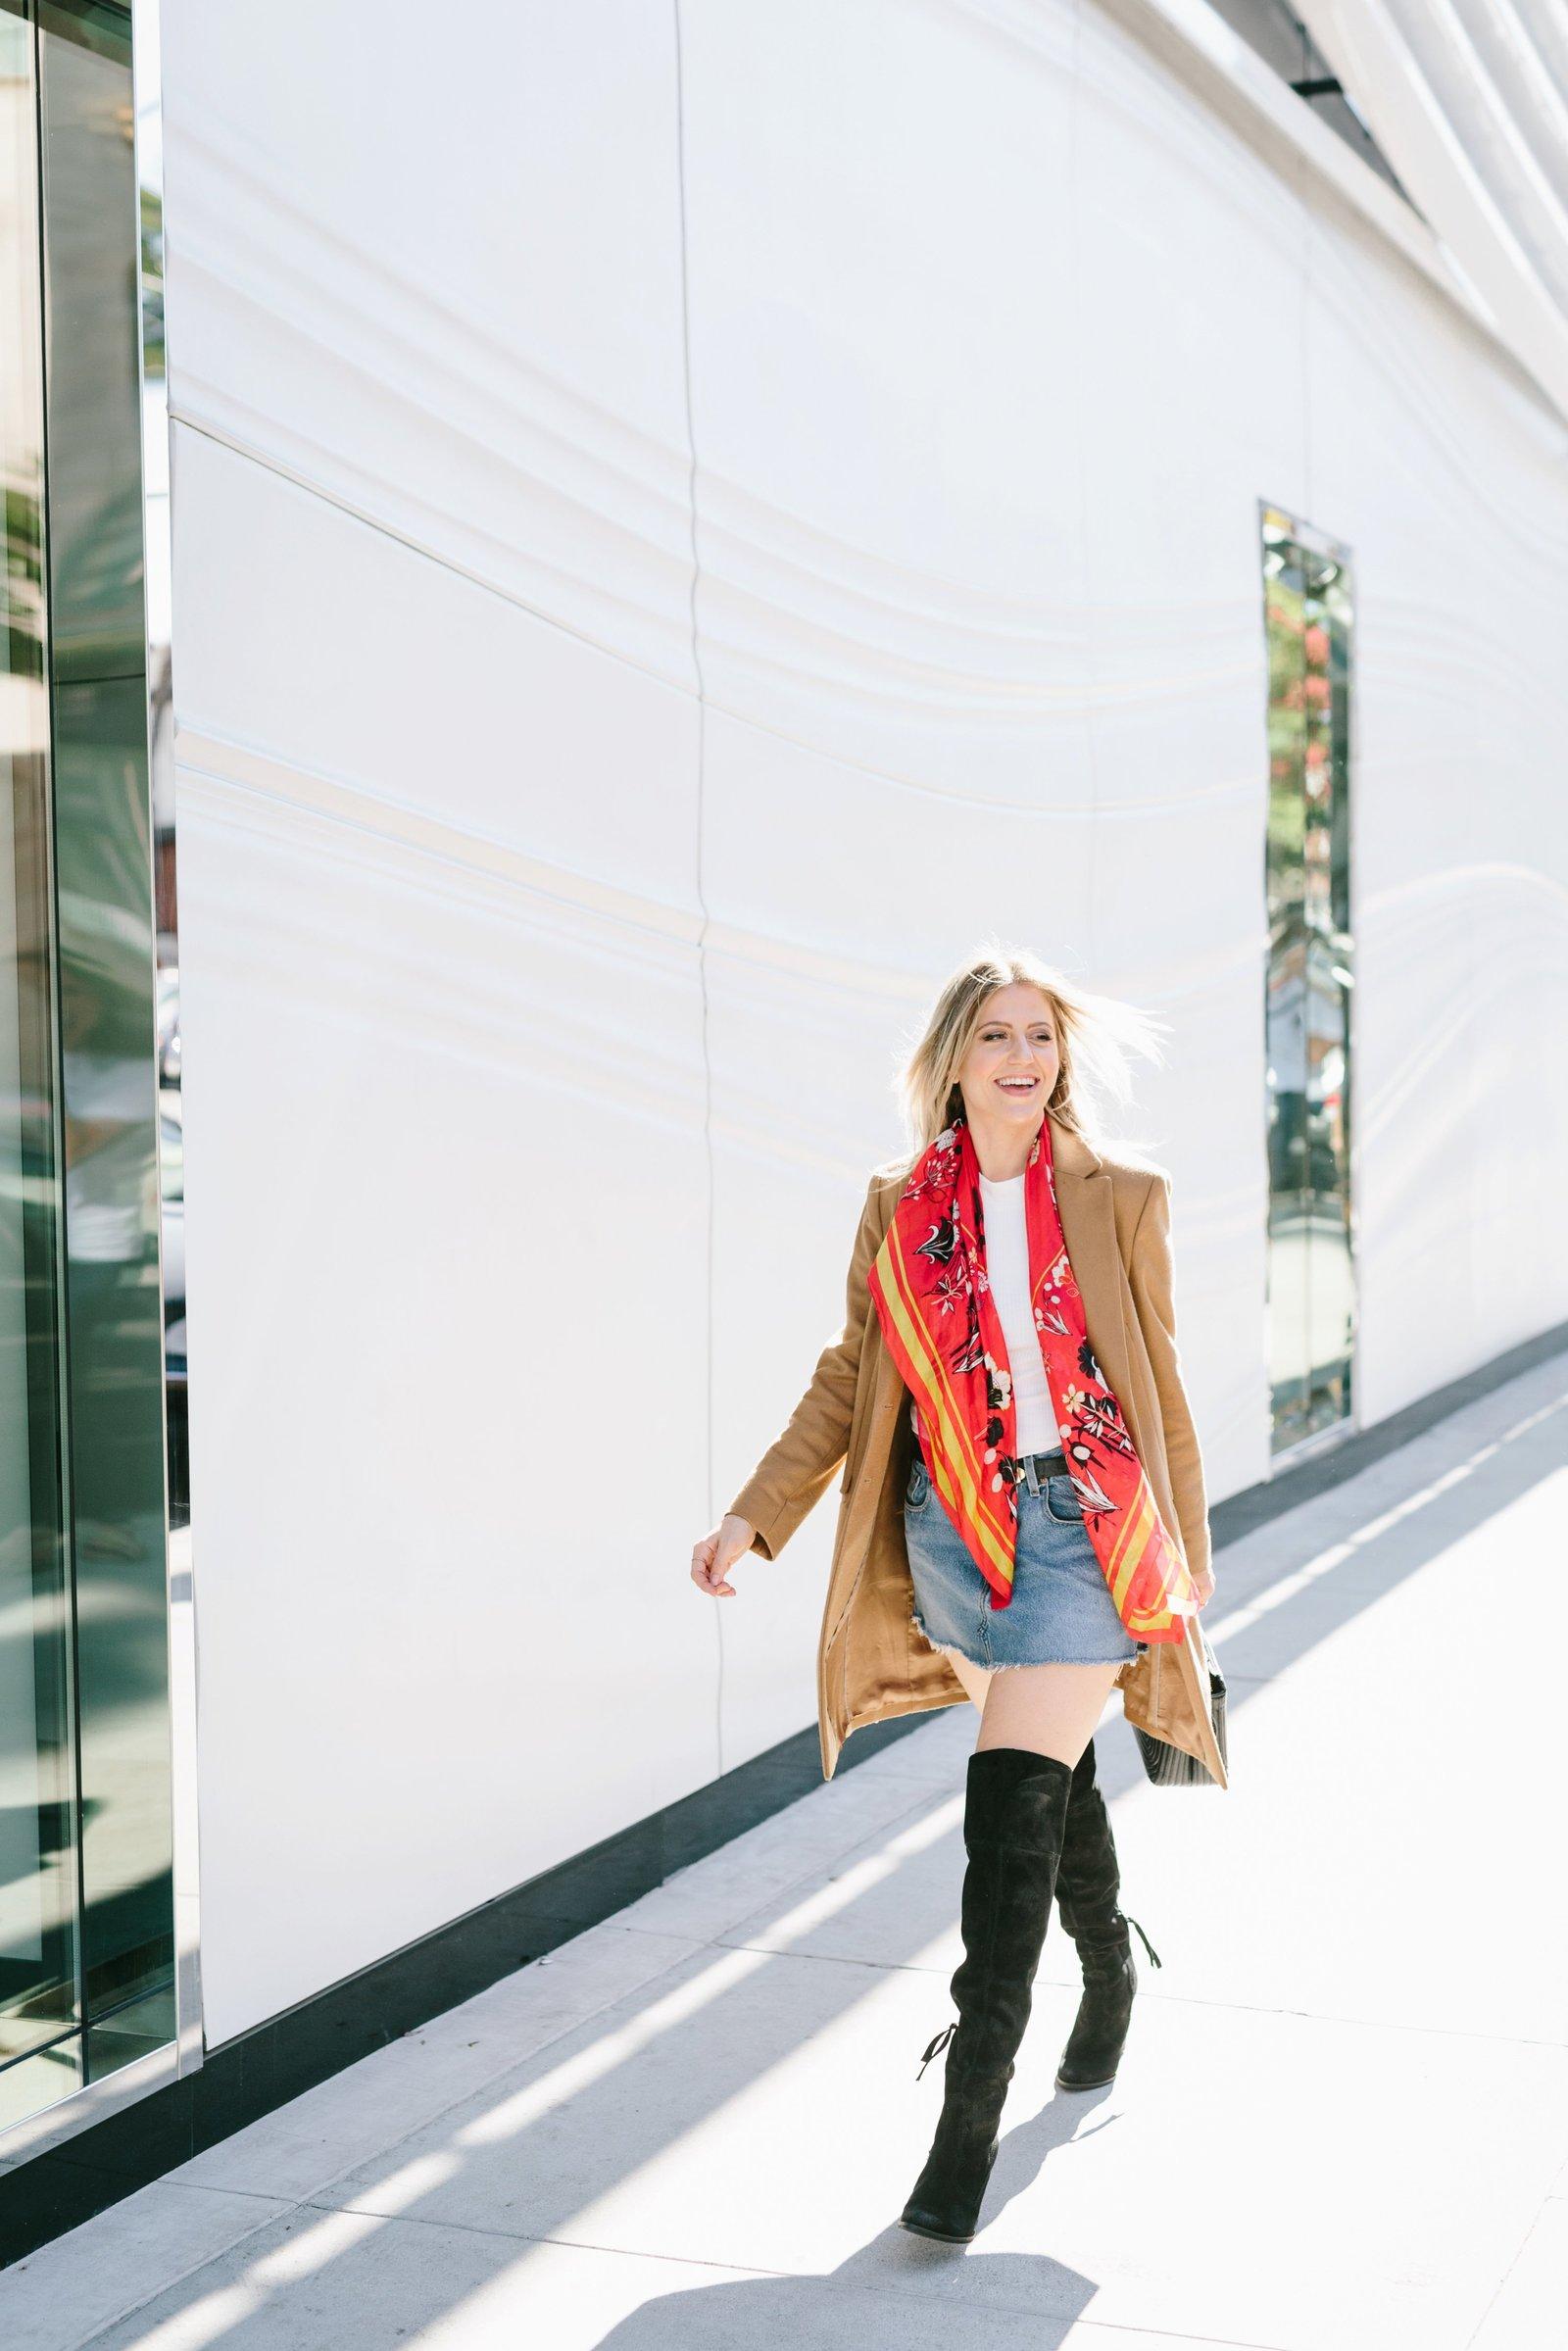 Fashion-Jodee Debes Photography-067